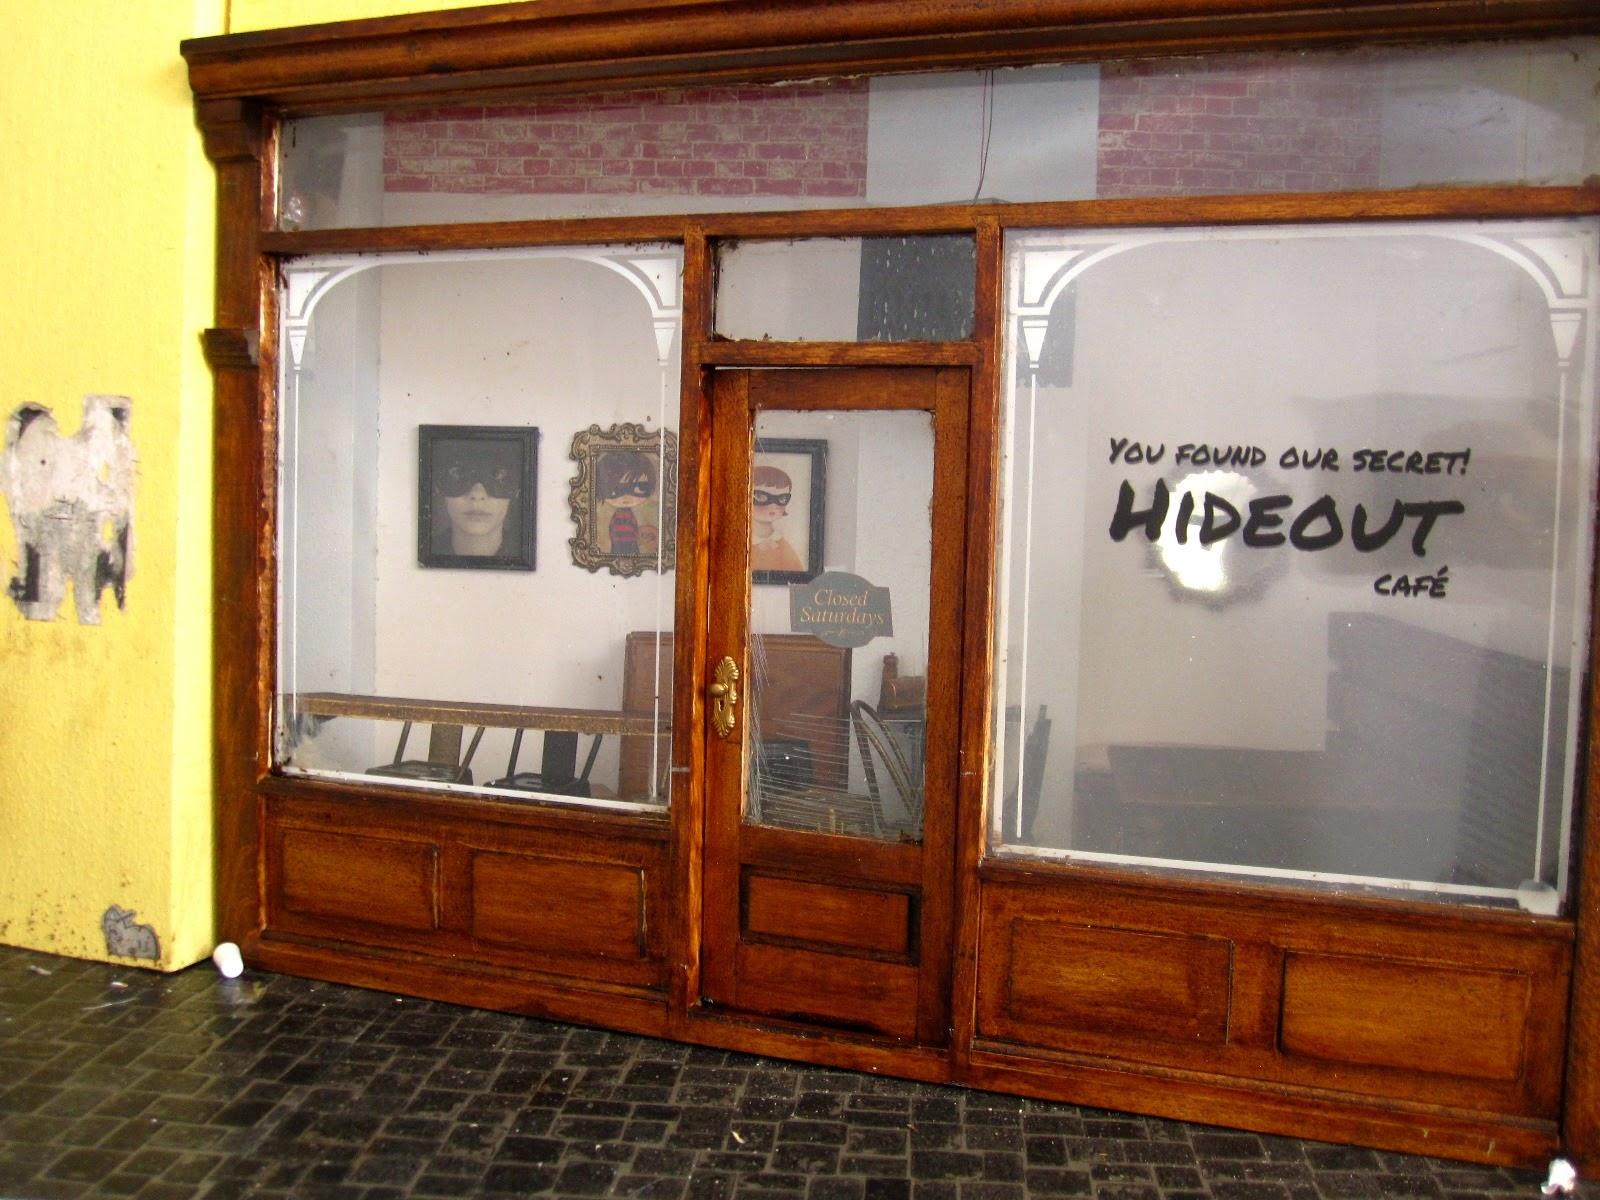 Modern dolls' house miniature cafe exterior.